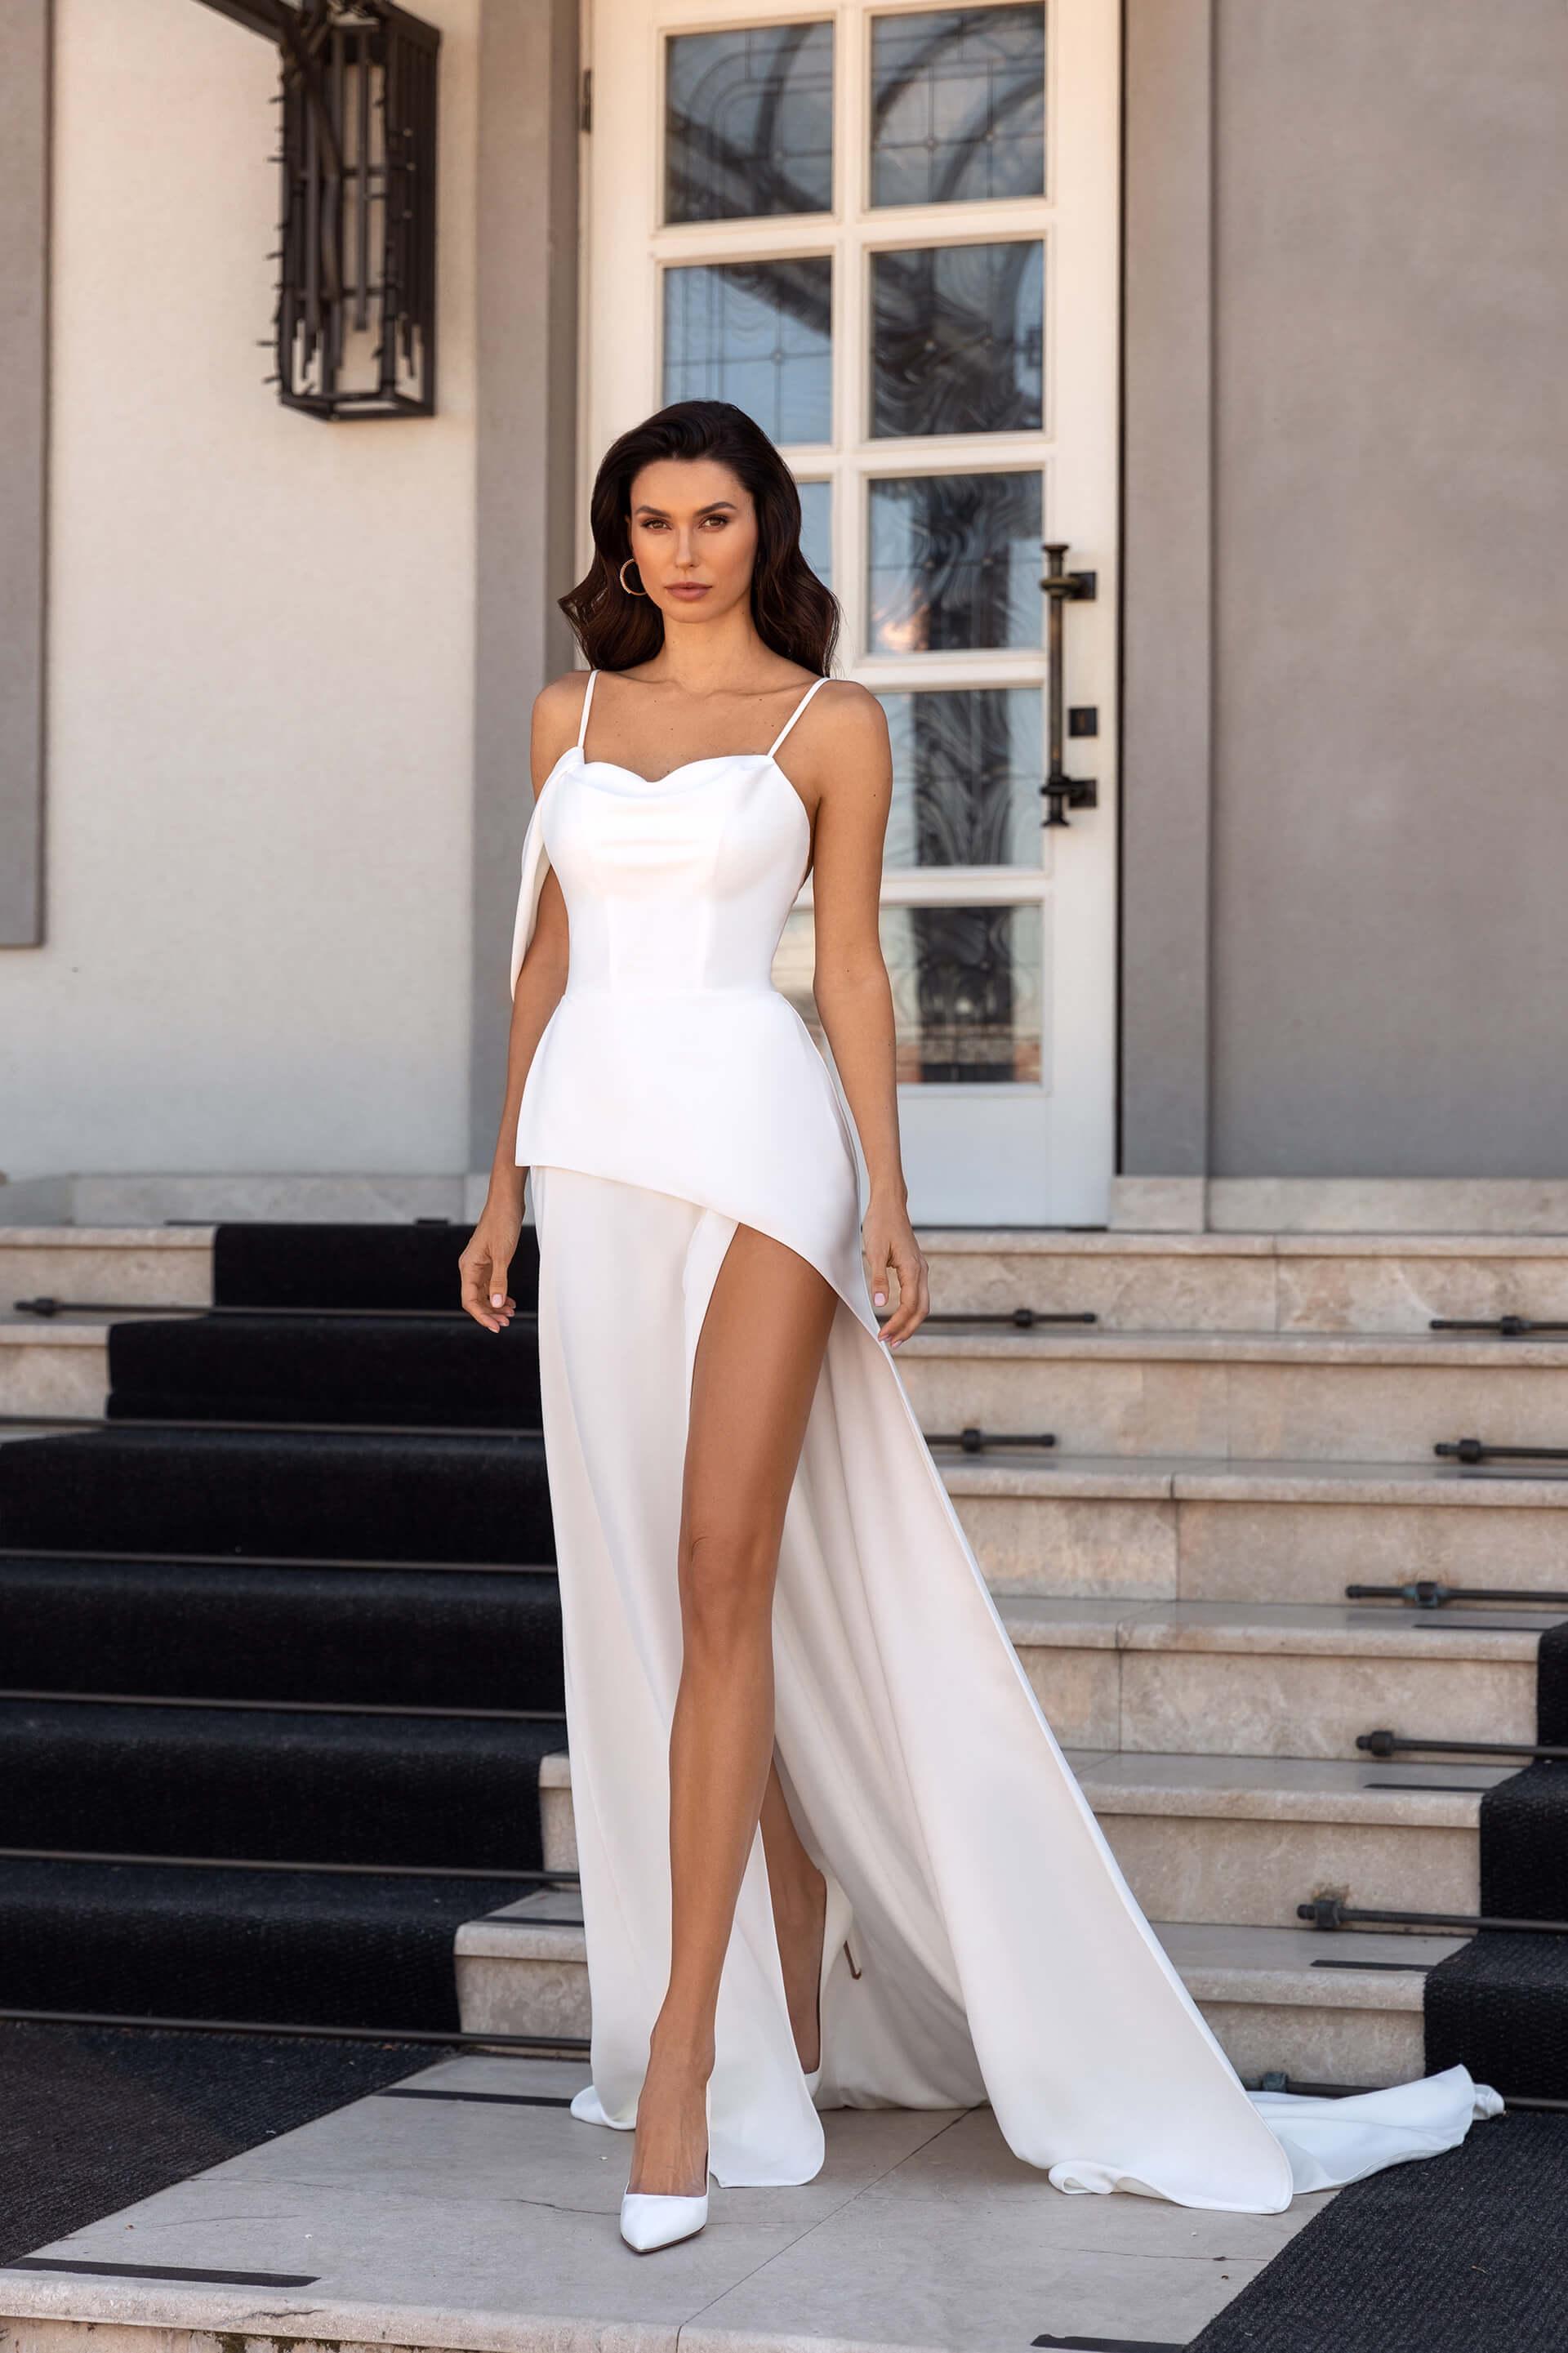 Свадебное платье Paola, Коллекция Elodie 2022, Anne-Mariée